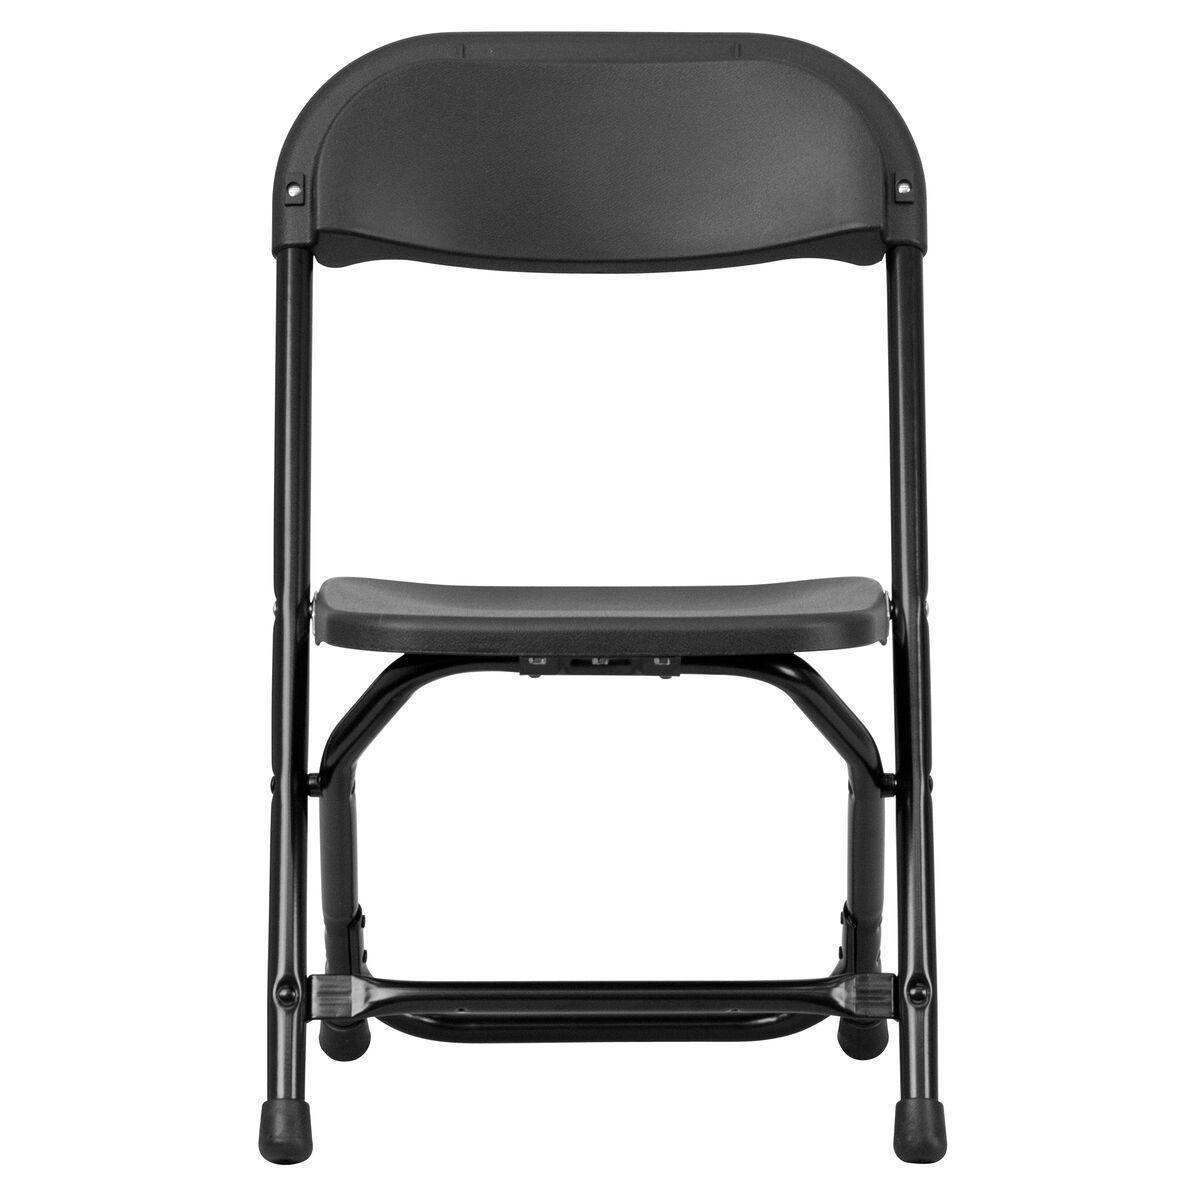 Kids Black Folding Chair Y Kid Bk Gg Churchchairs4less Com